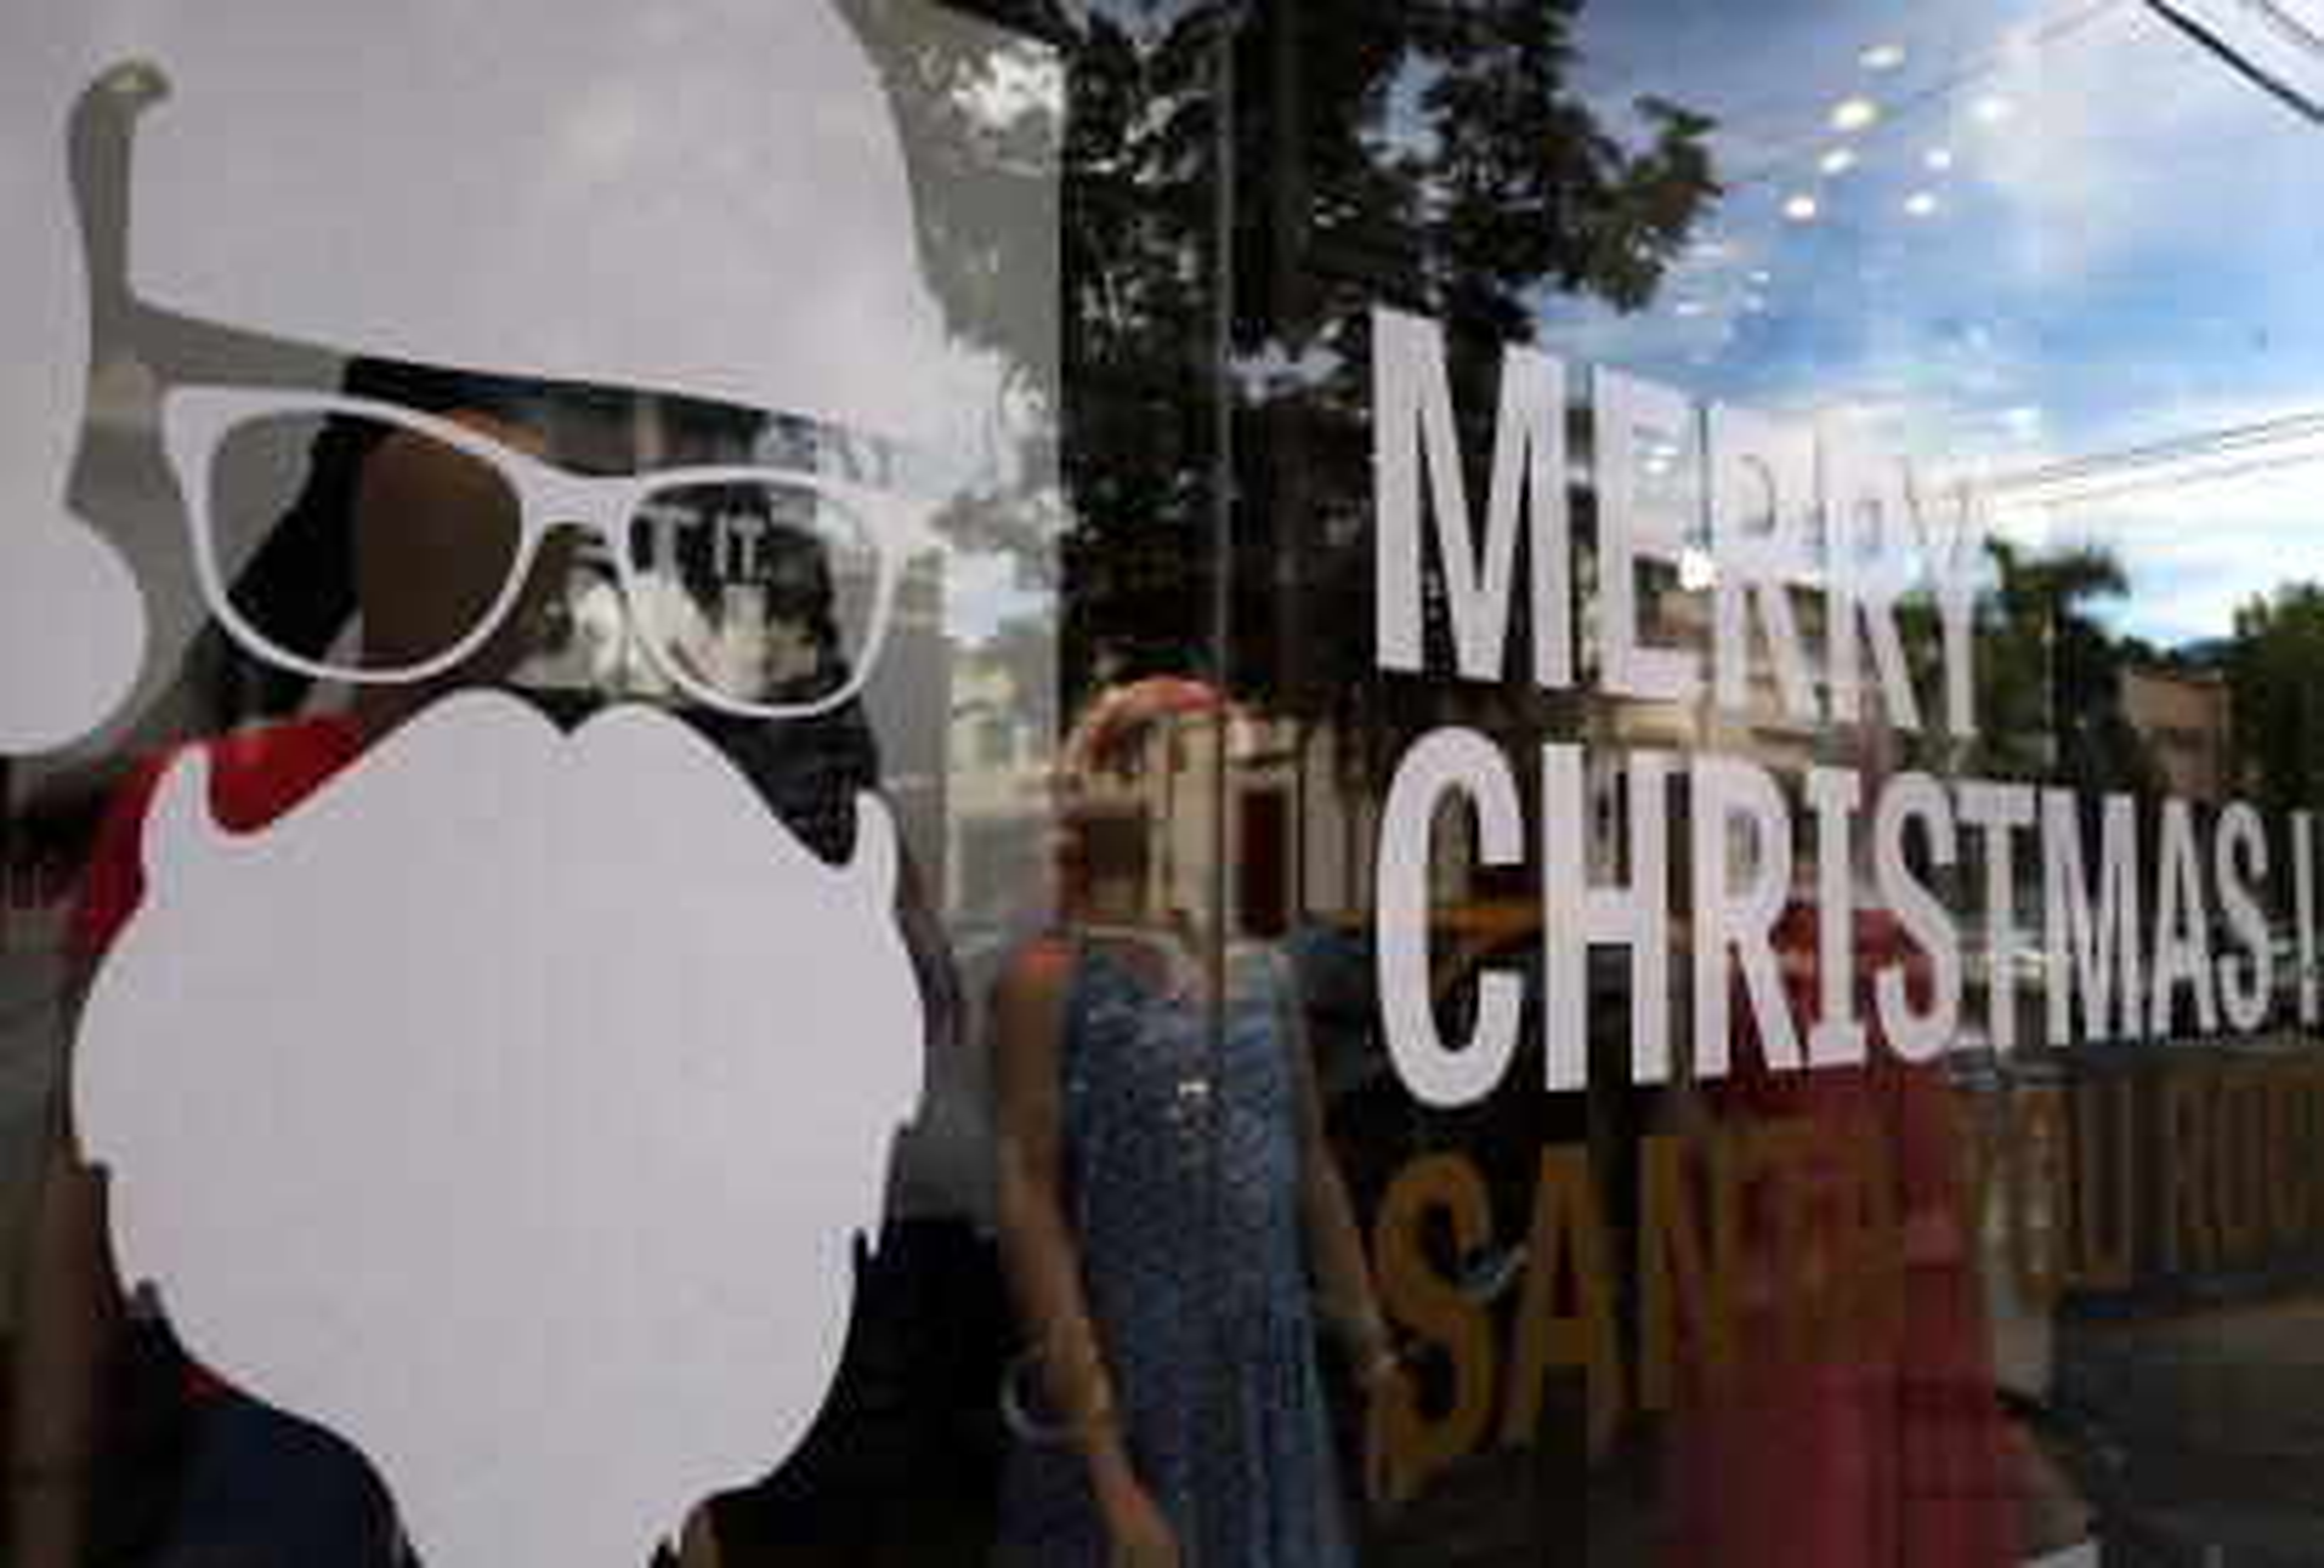 Santa Claus image in store window.